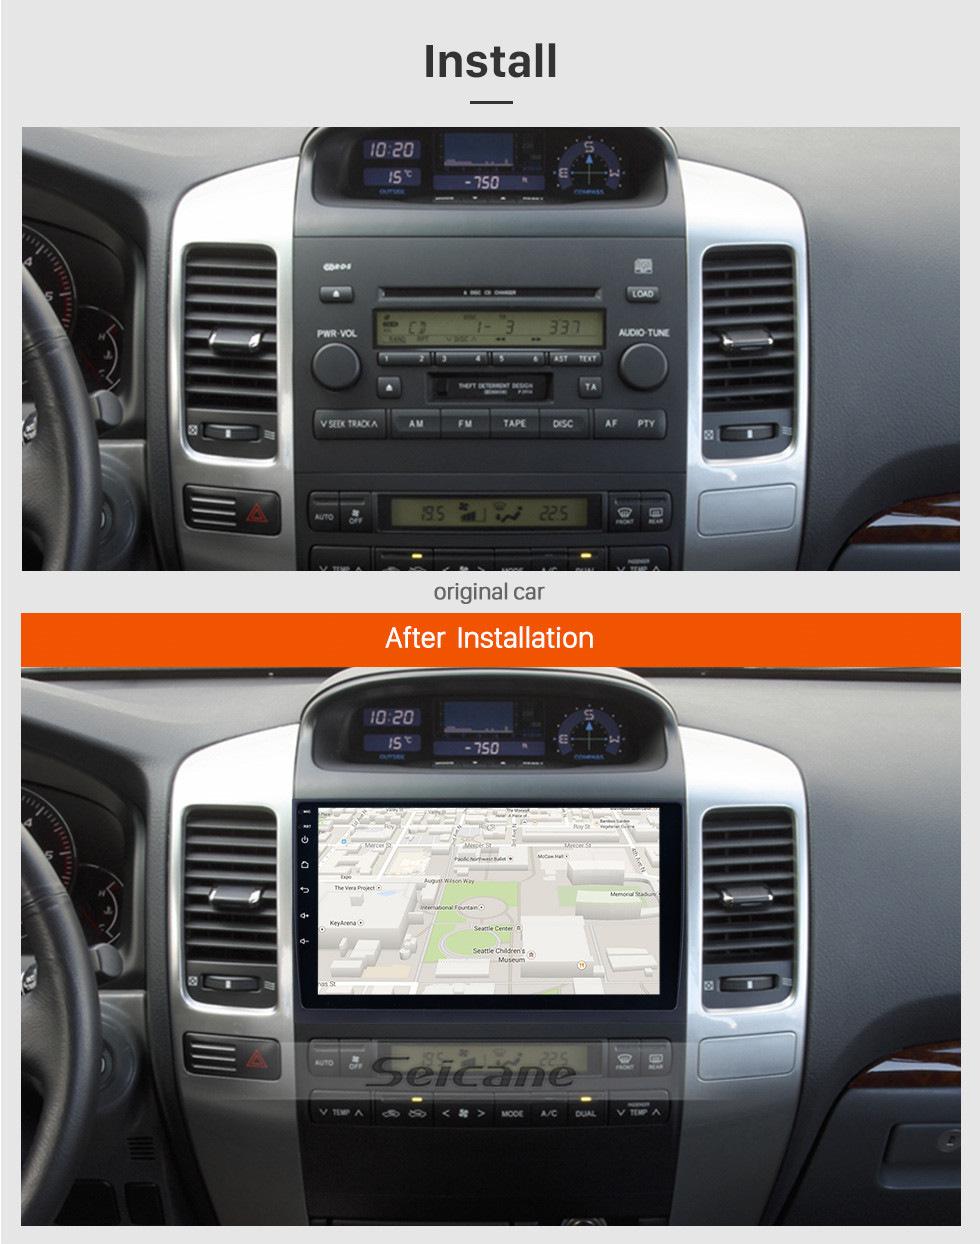 Seicane Android 8.1 2004 2005 2006 2007 2008 2009 Toyota Prado Radio GPS Navigationssystem mit Bluetooth HD Touchscreen WIFI 1080P DVR Spiegelverbindung Rückfahrkamera